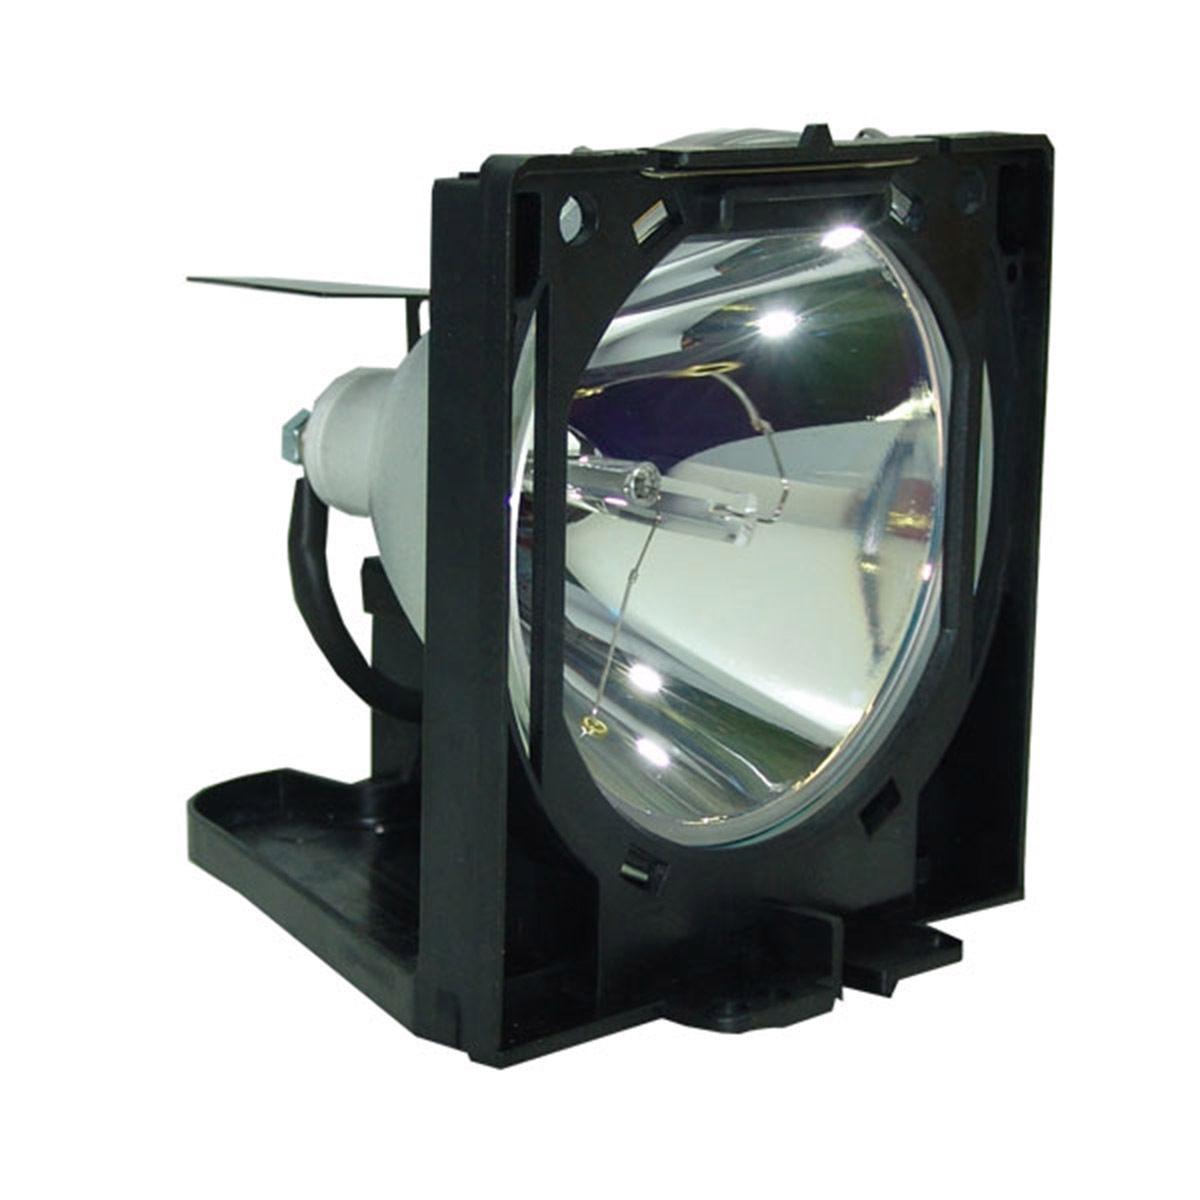 POA-LMP18 610-279-5417 for SANYO PLC-XP07 PLC-SP20 PLC-XP10A PLC-XP10BA PLC-XP10EA PLC-XP10NA Projector Bulb Lamp With Housing replacement projector lamp bulb poa lmp18 for sanyo plc xp07 pcl sp20 plc xp10na projectors etc